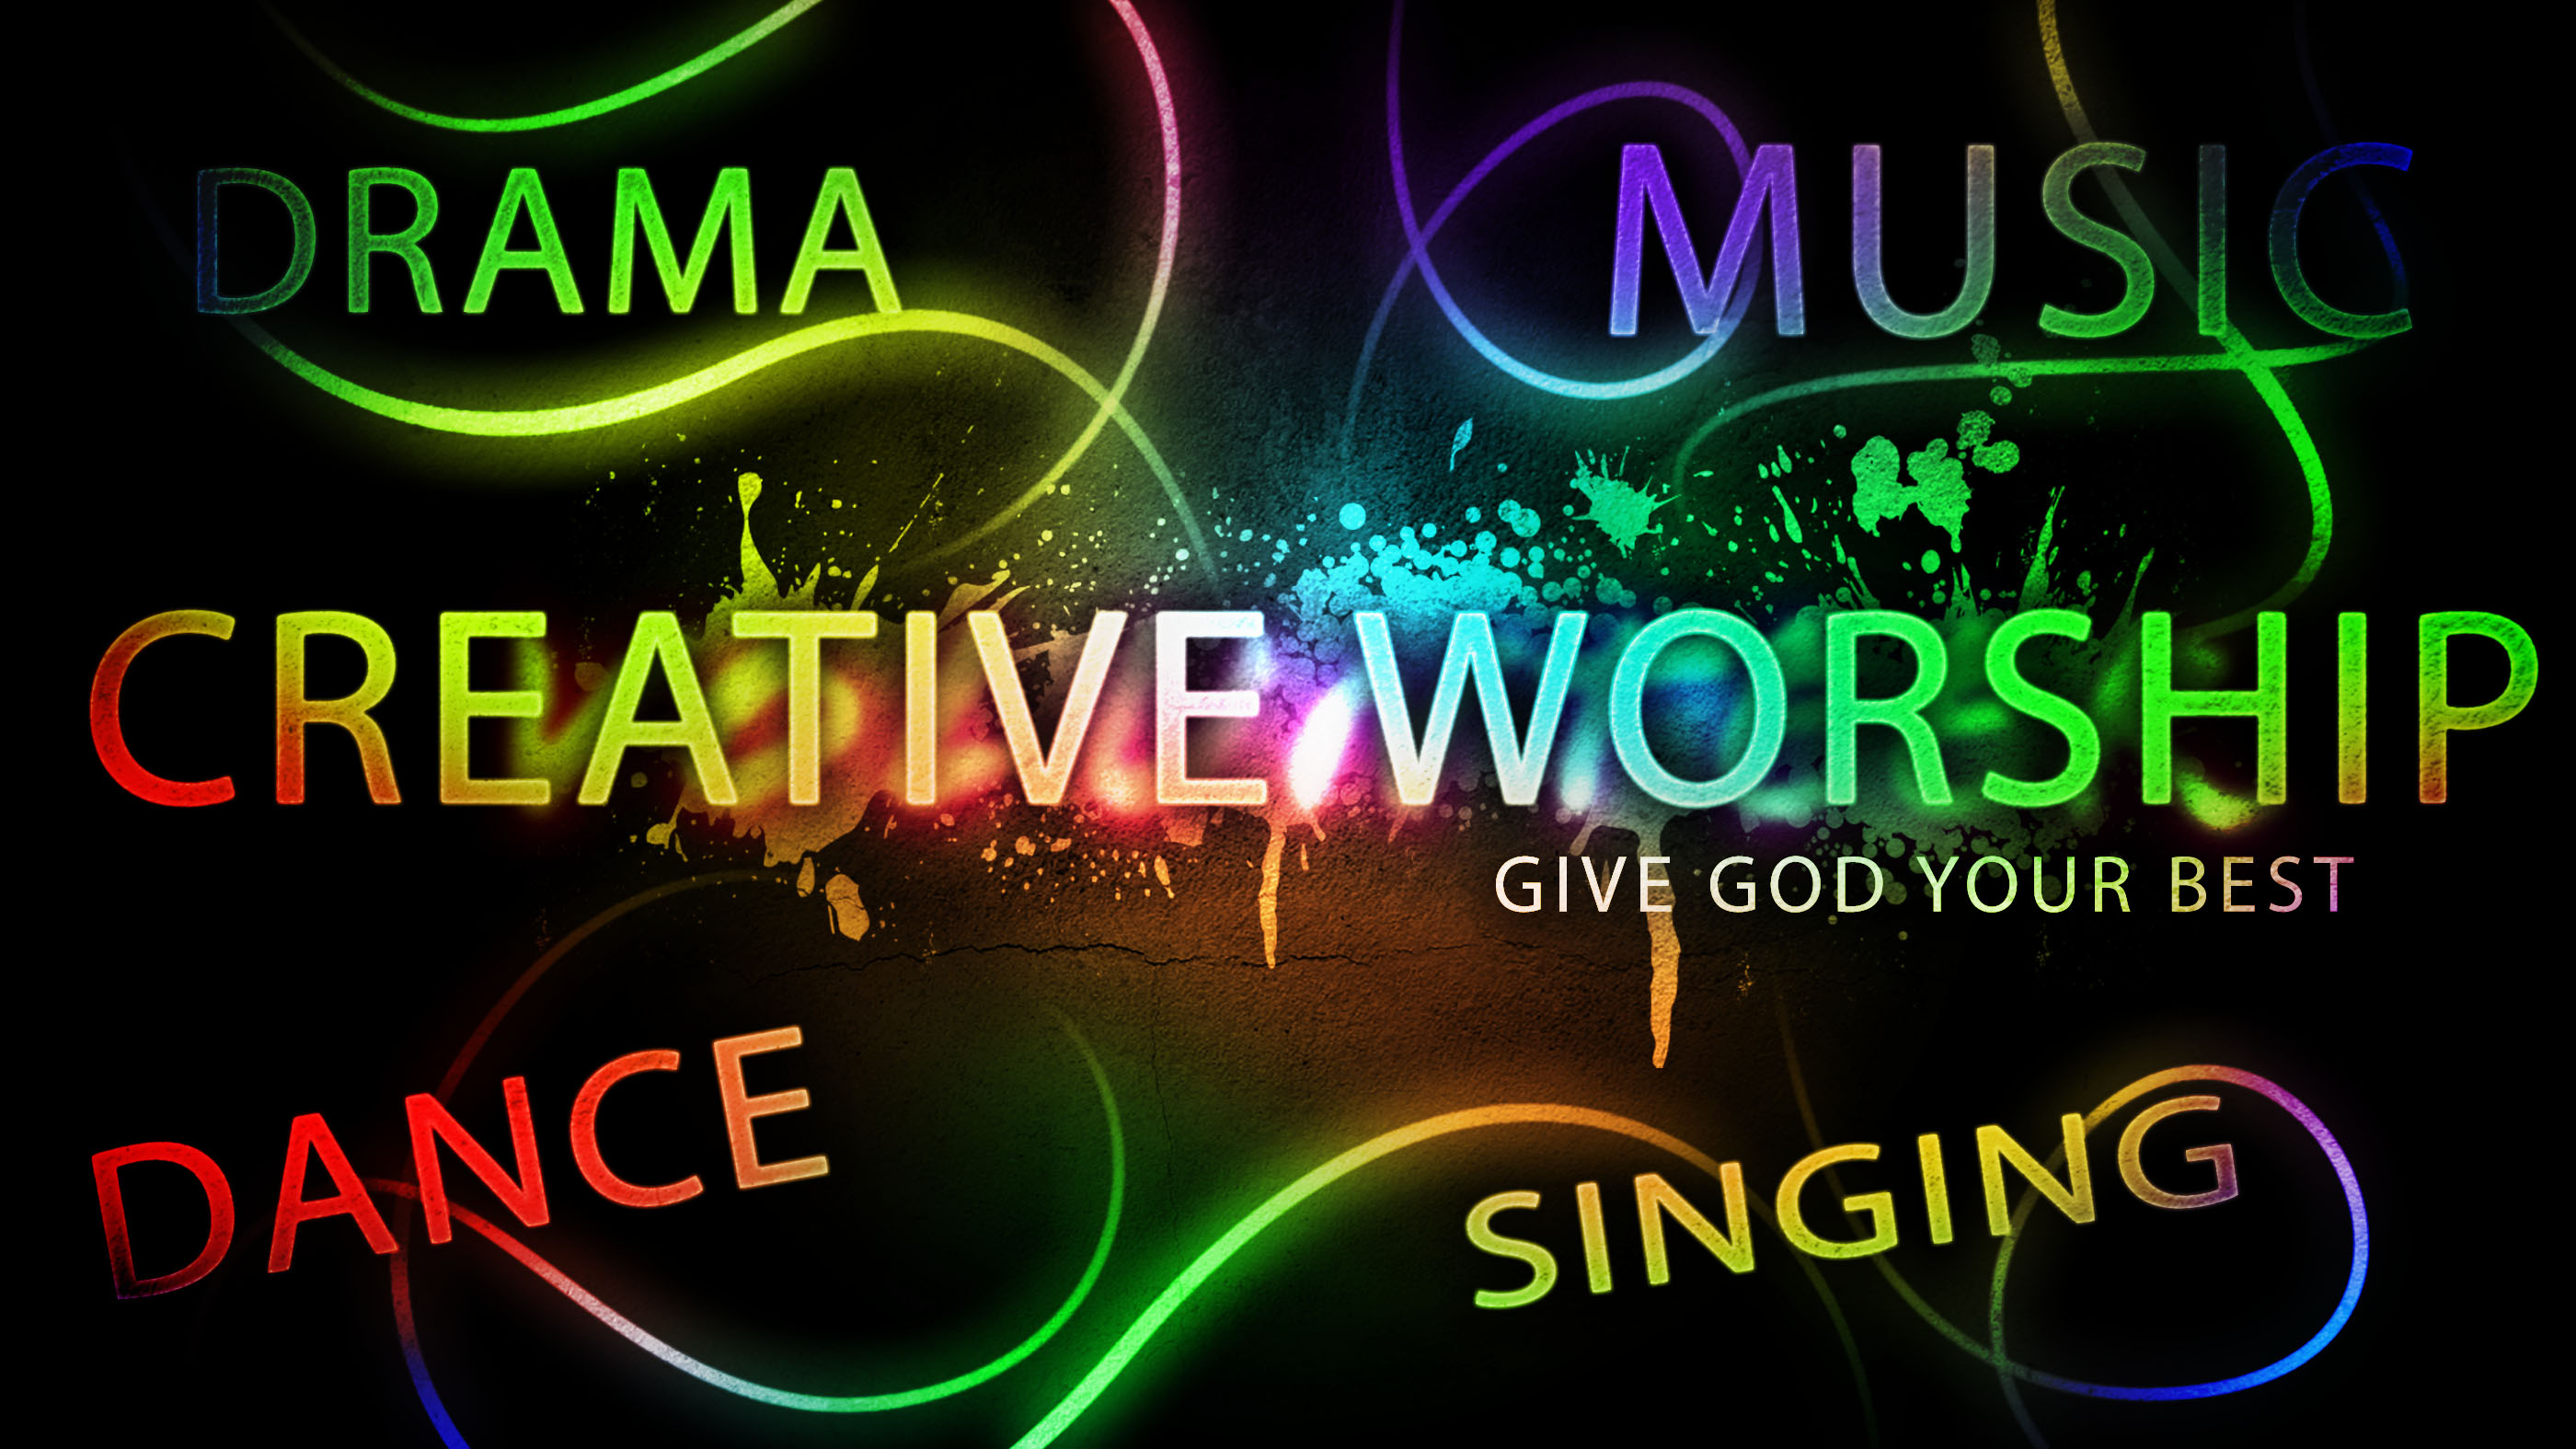 Creative Worship